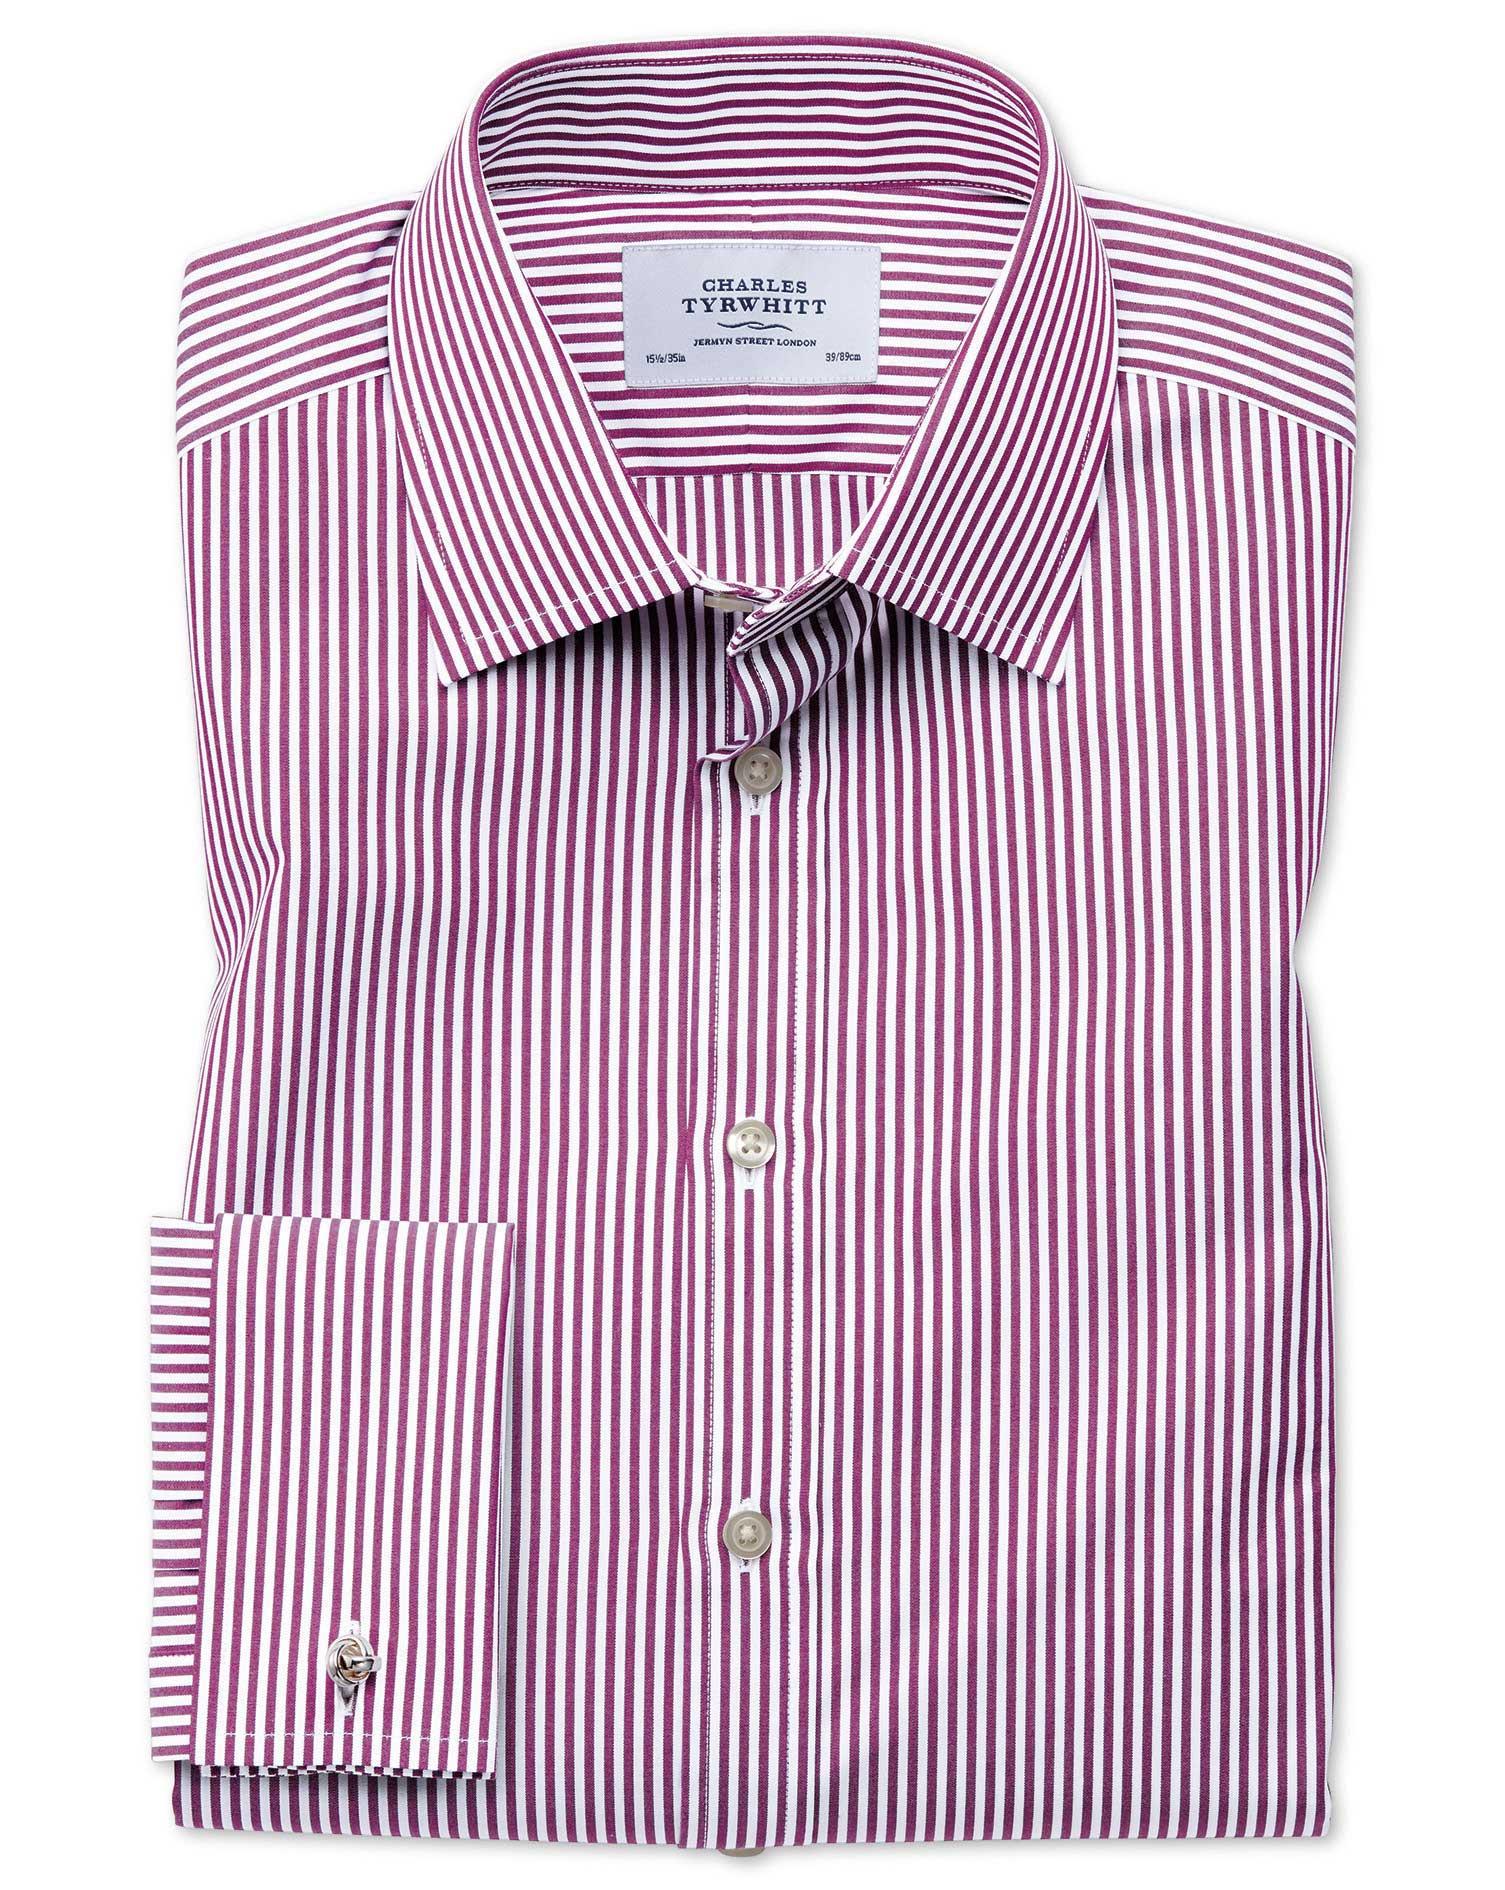 Classic Fit Bengal Stripe Purple Cotton Formal Shirt Single Cuff Size 18/35 by Charles Tyrwhitt